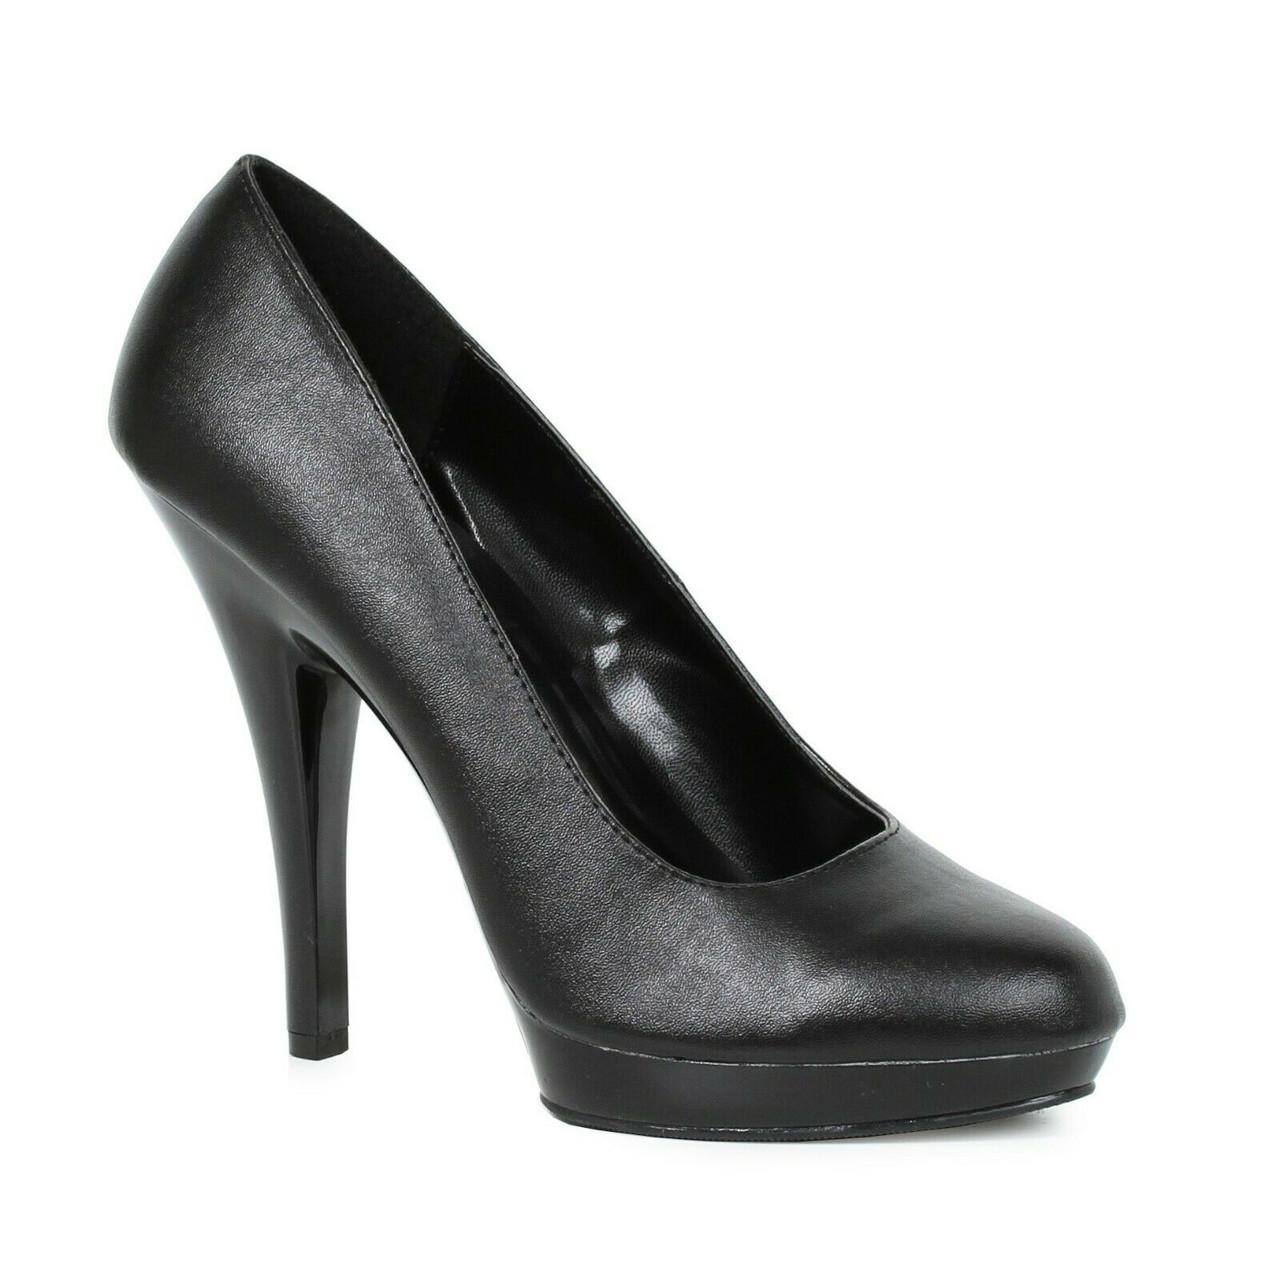 Ellie Shoes Wide Width Halloween